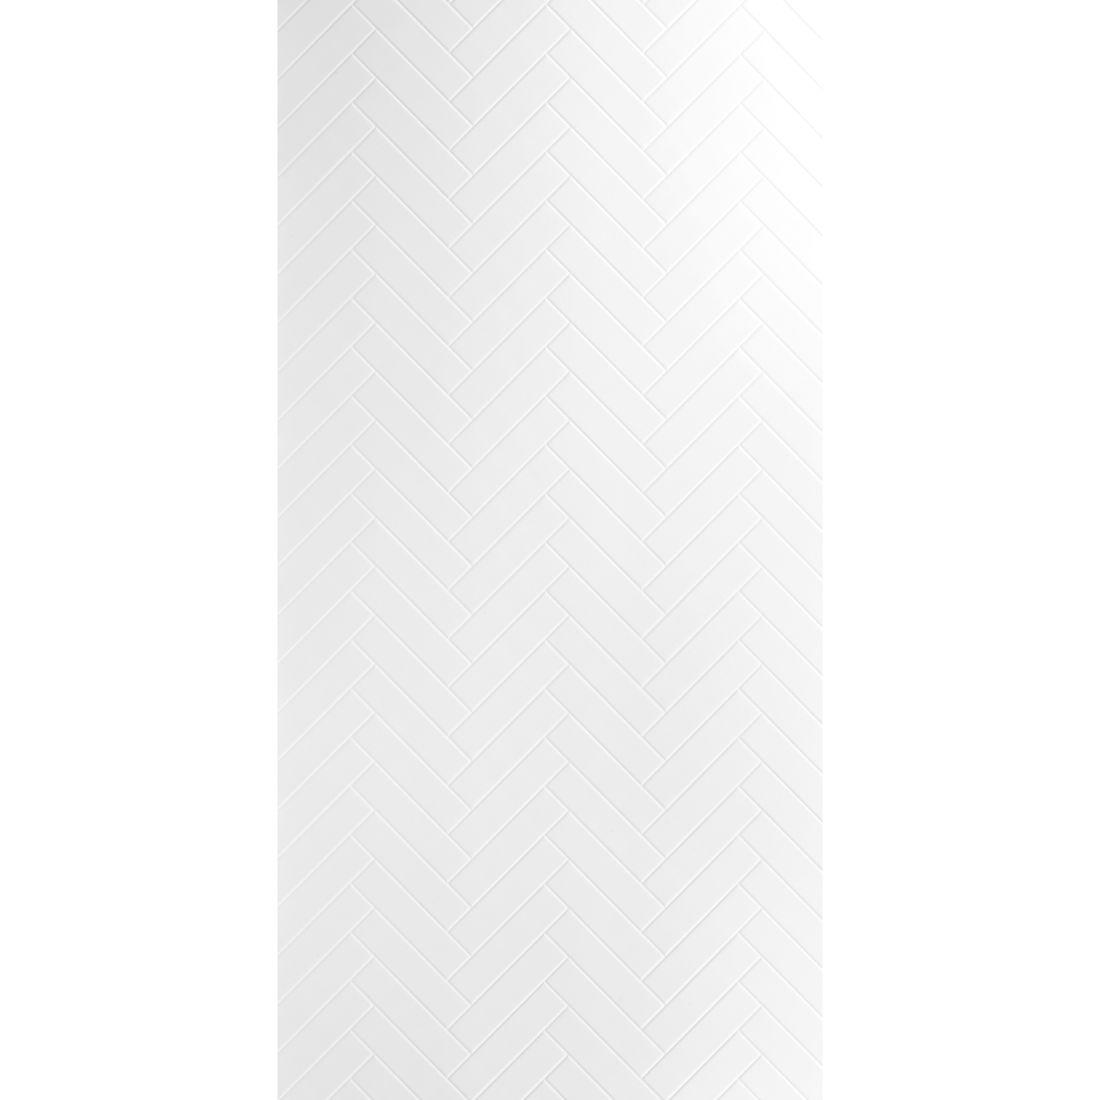 Aqua Wall Lining Panel Polar White Herringbone 2400 x 1200 x 4.5mm